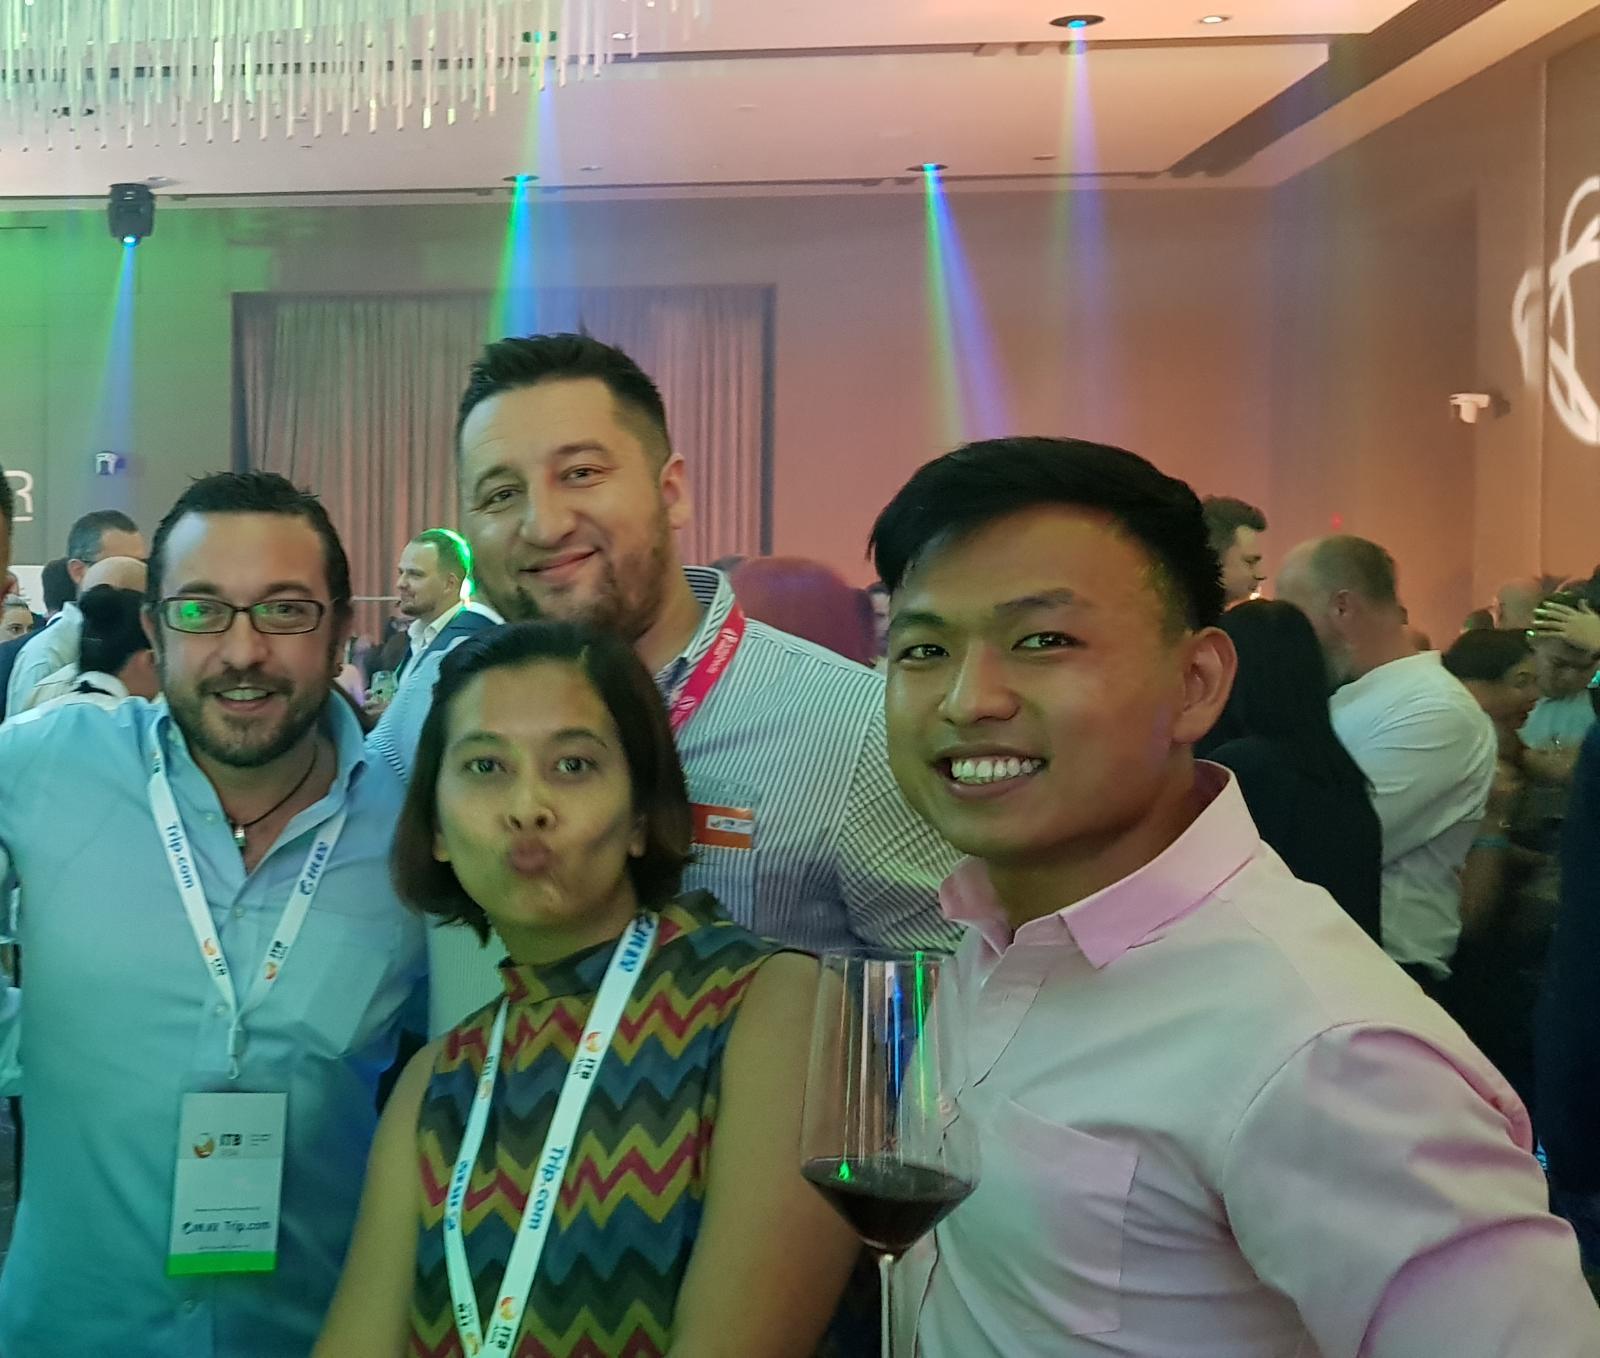 From left to right:  Mr Xavier Llinas Metre (HotelsQuickly), Ms Badriya Wilaiwan (Travpax), Mr Ilja Panov (Hotelbeds), Mr Leonard Chiang (FLA).